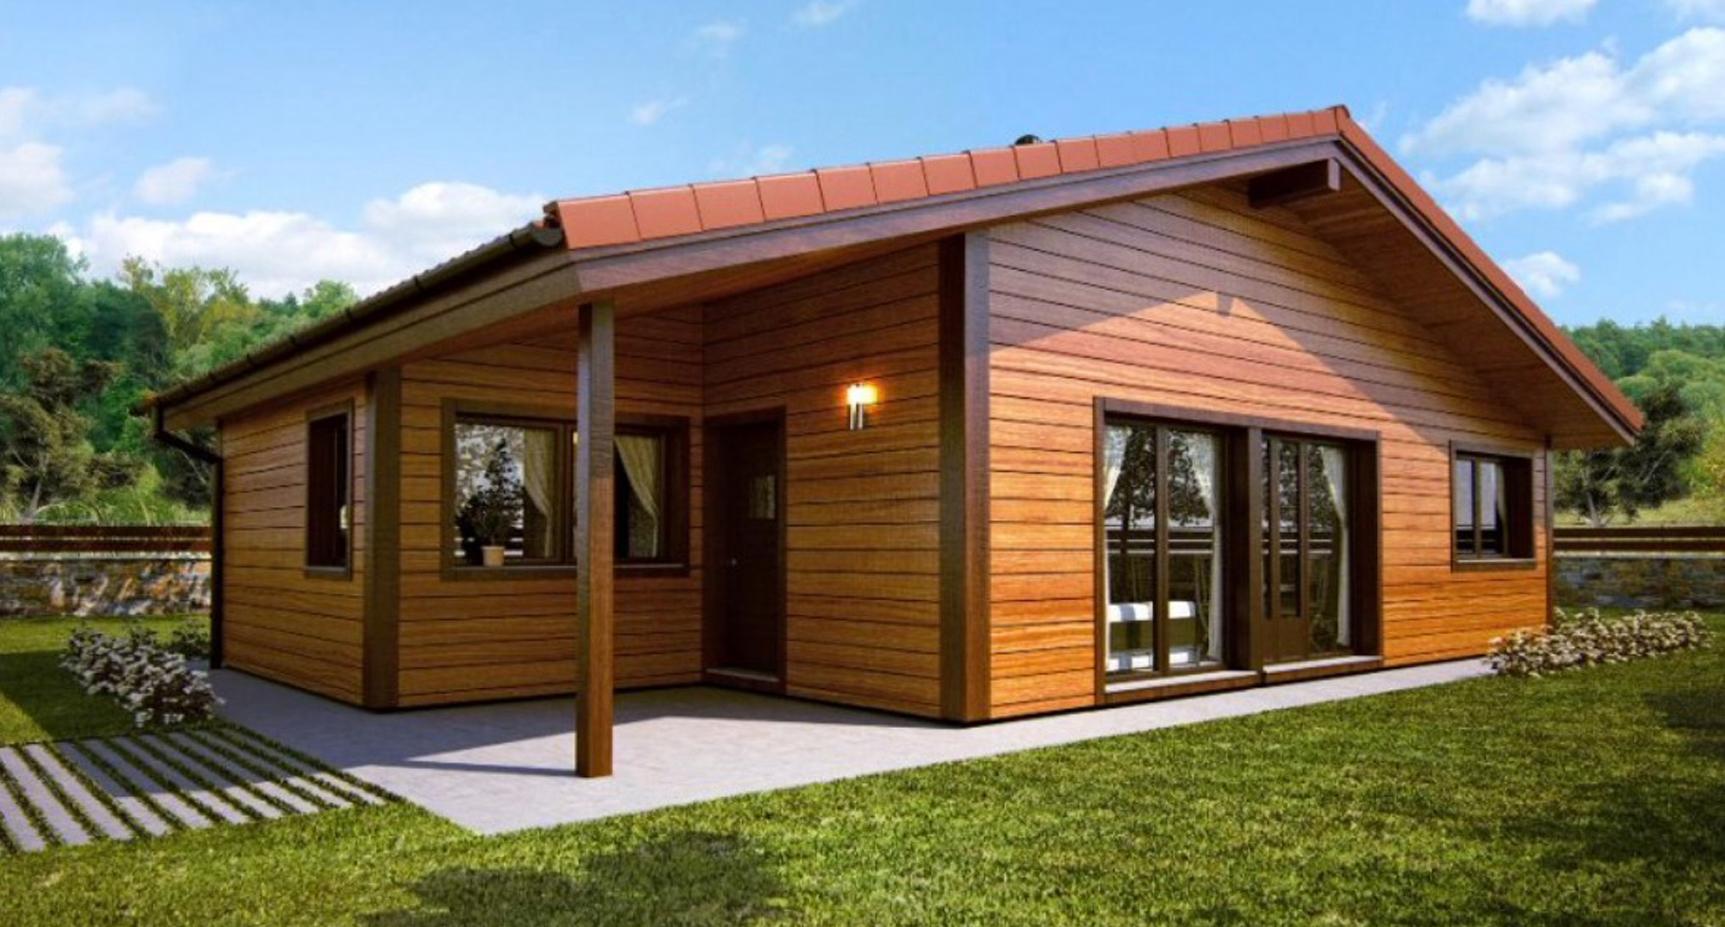 Casas de madera cadiz elegant casa de madera con piscina with casas de madera cadiz del hombre - Casas de madera en cadiz ...